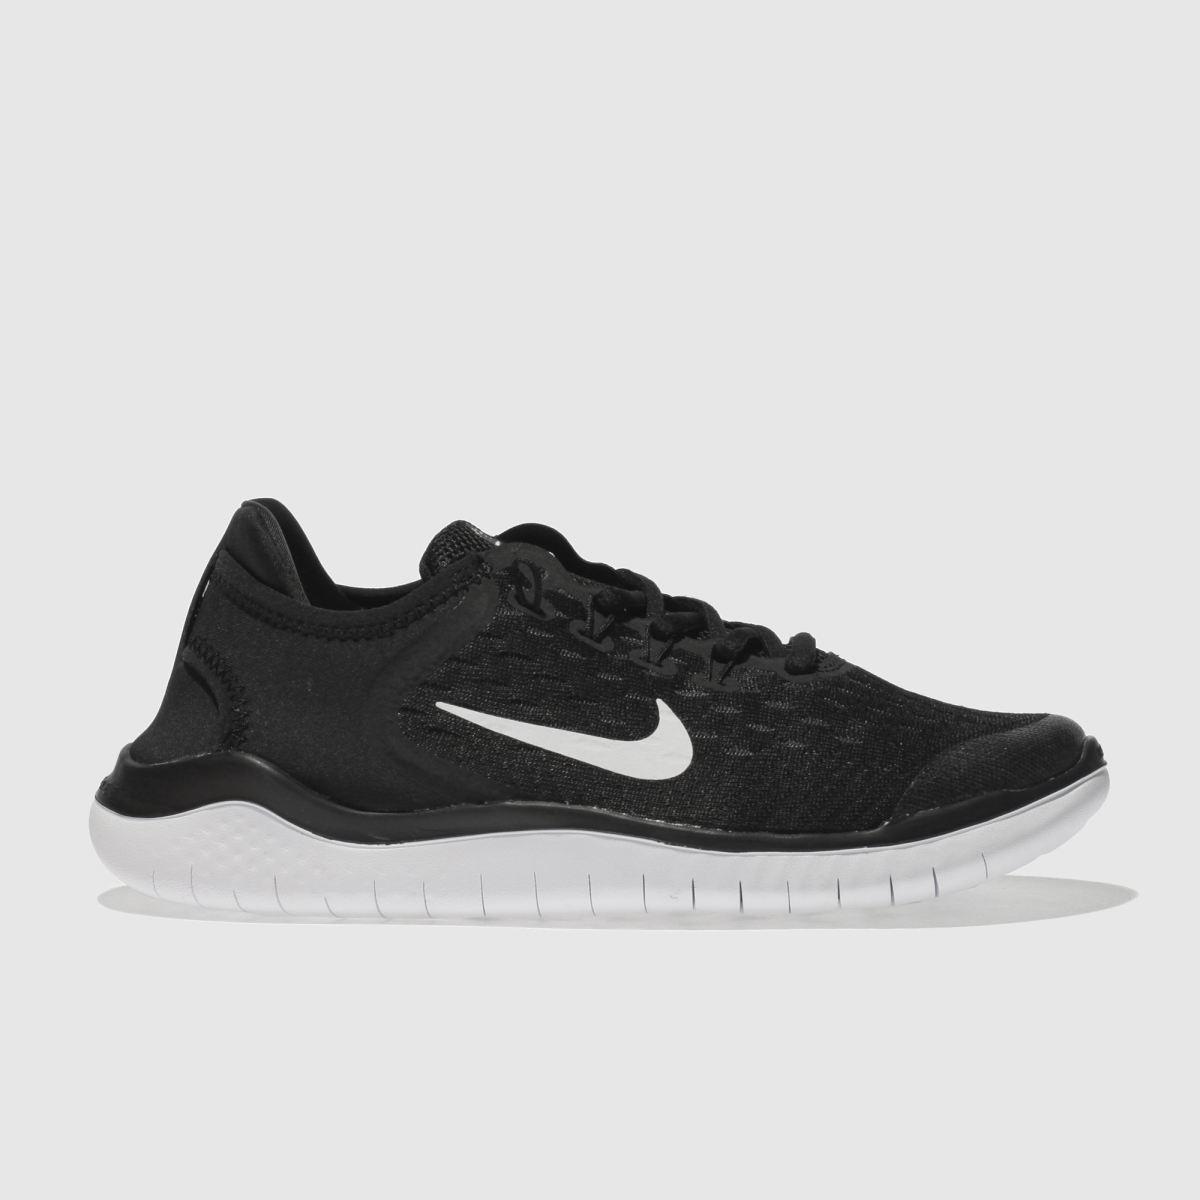 Nike Black & White Free Rn 2018 Youth Trainers